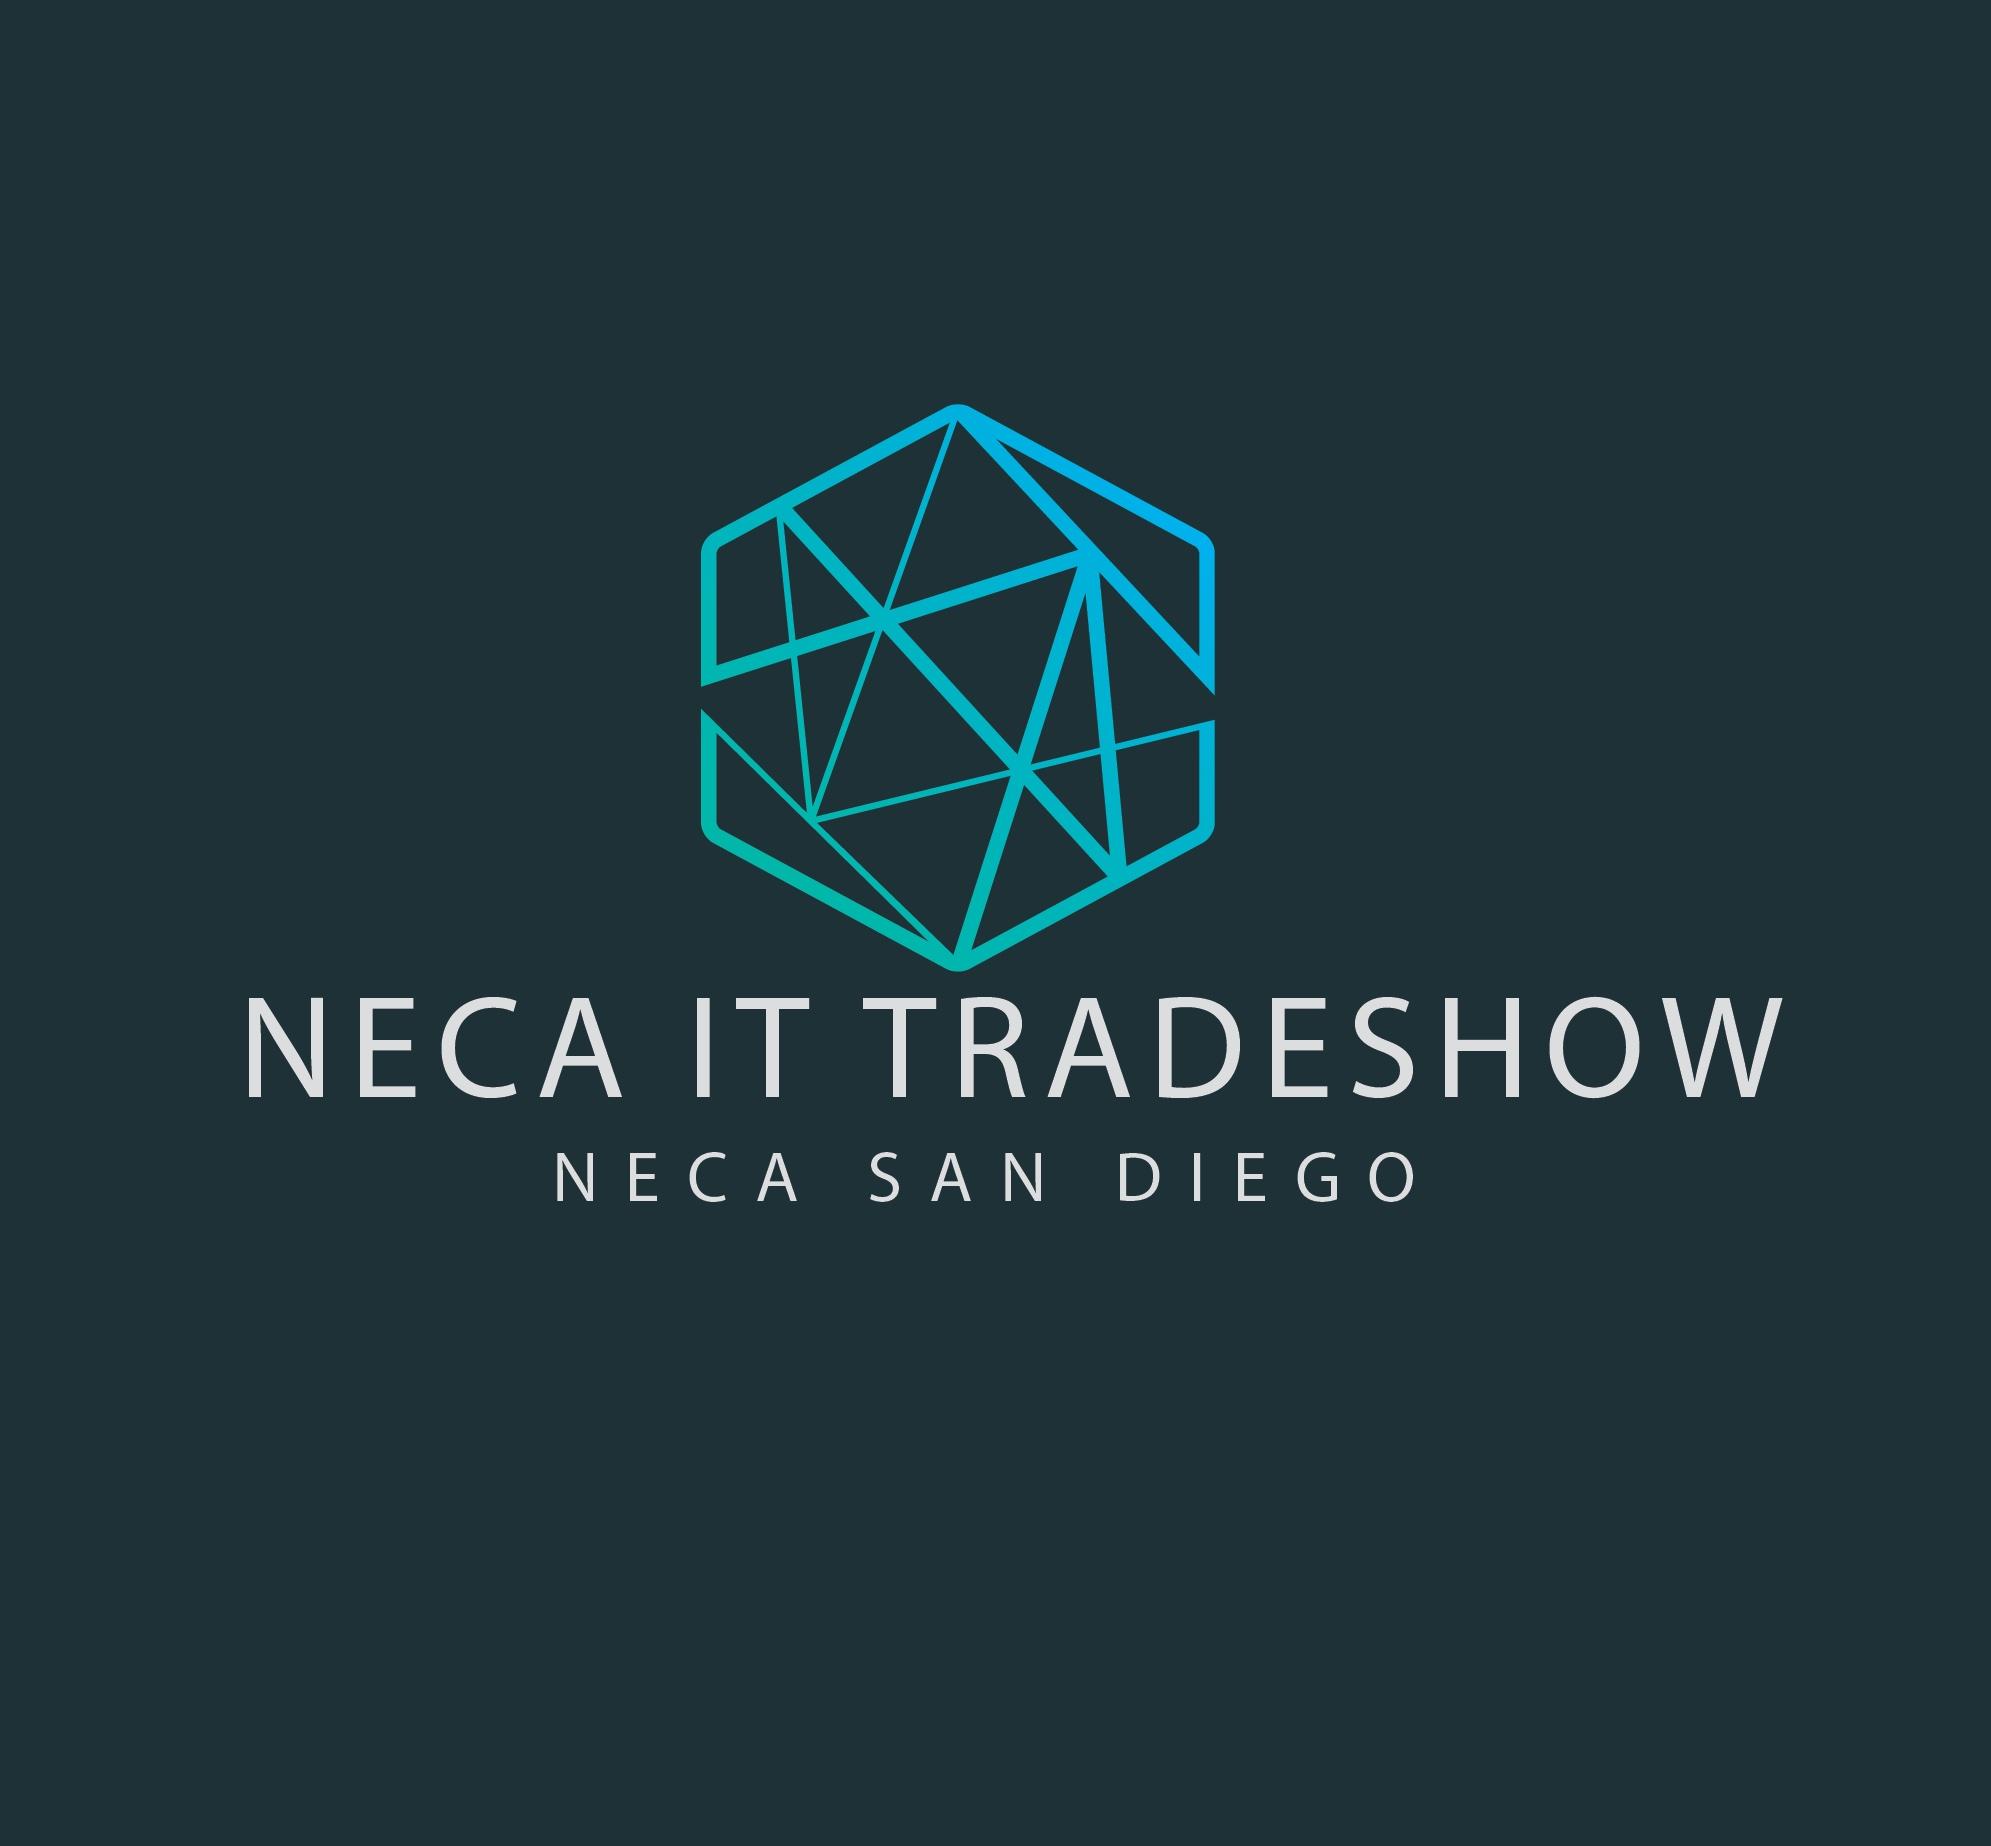 NECA Tradeshow 2021 Tasting Set bottle